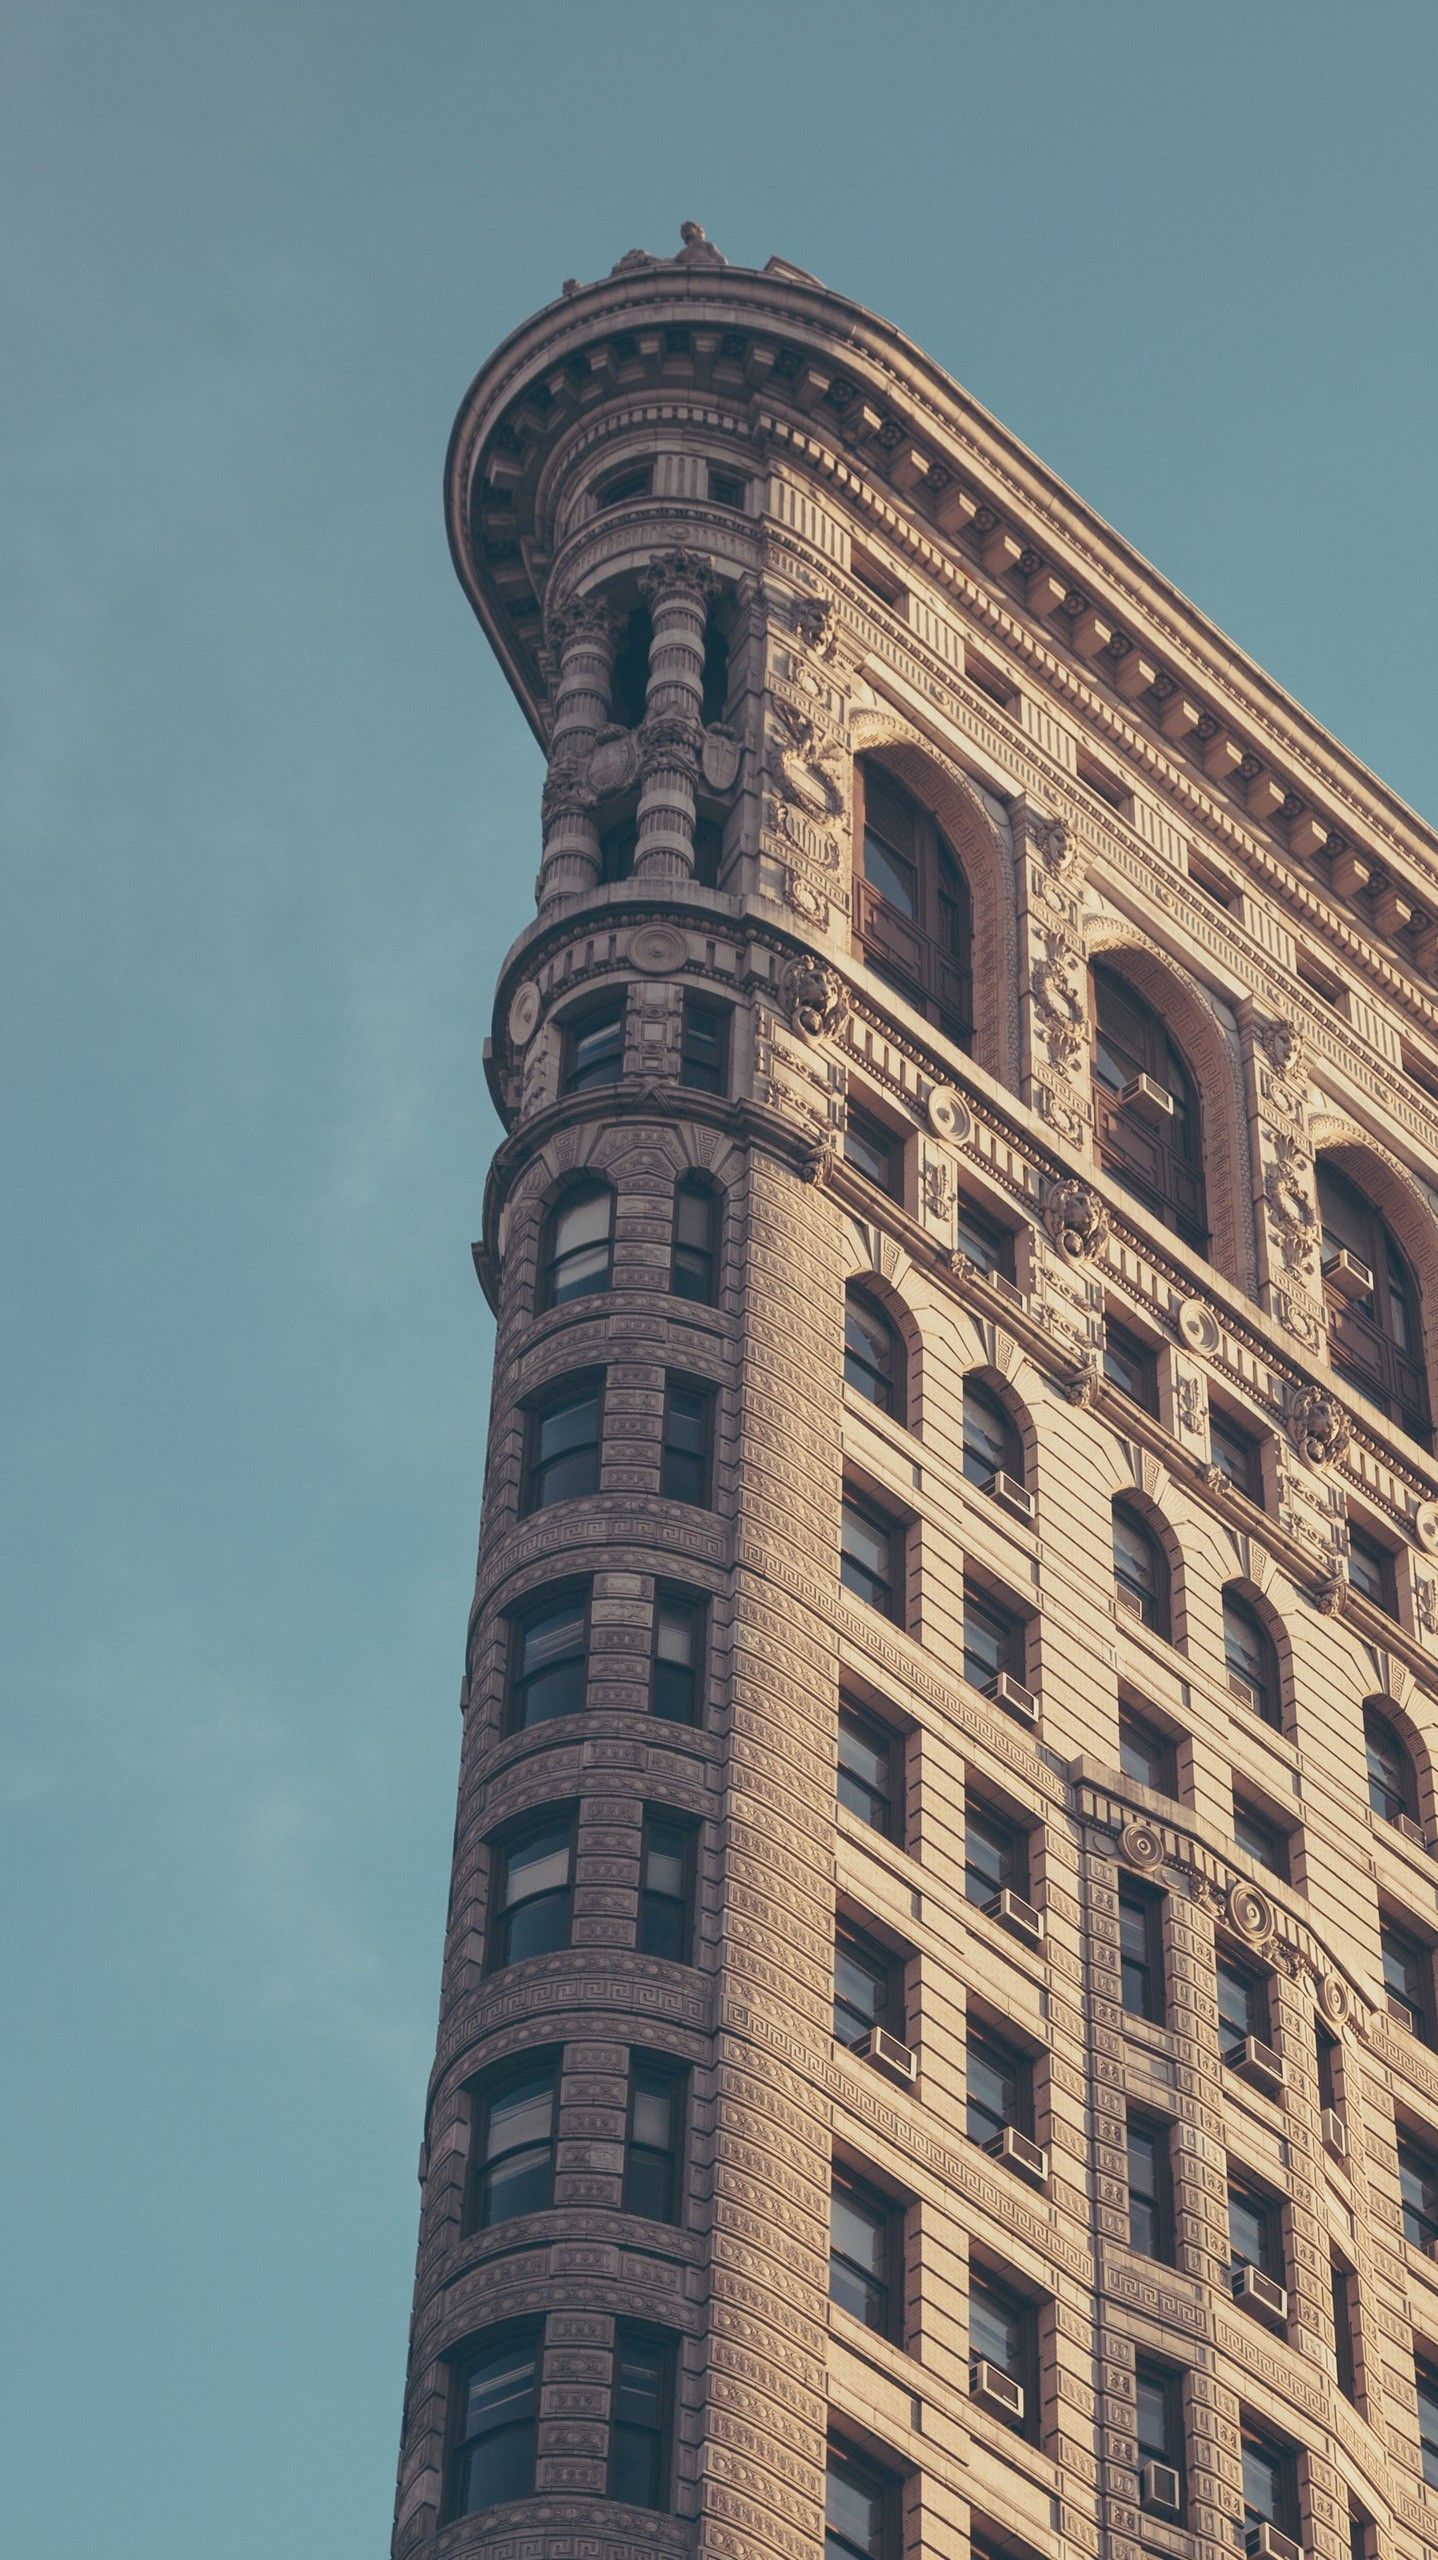 Flatiron Building New York City Minimal Iphone Wallpaper In